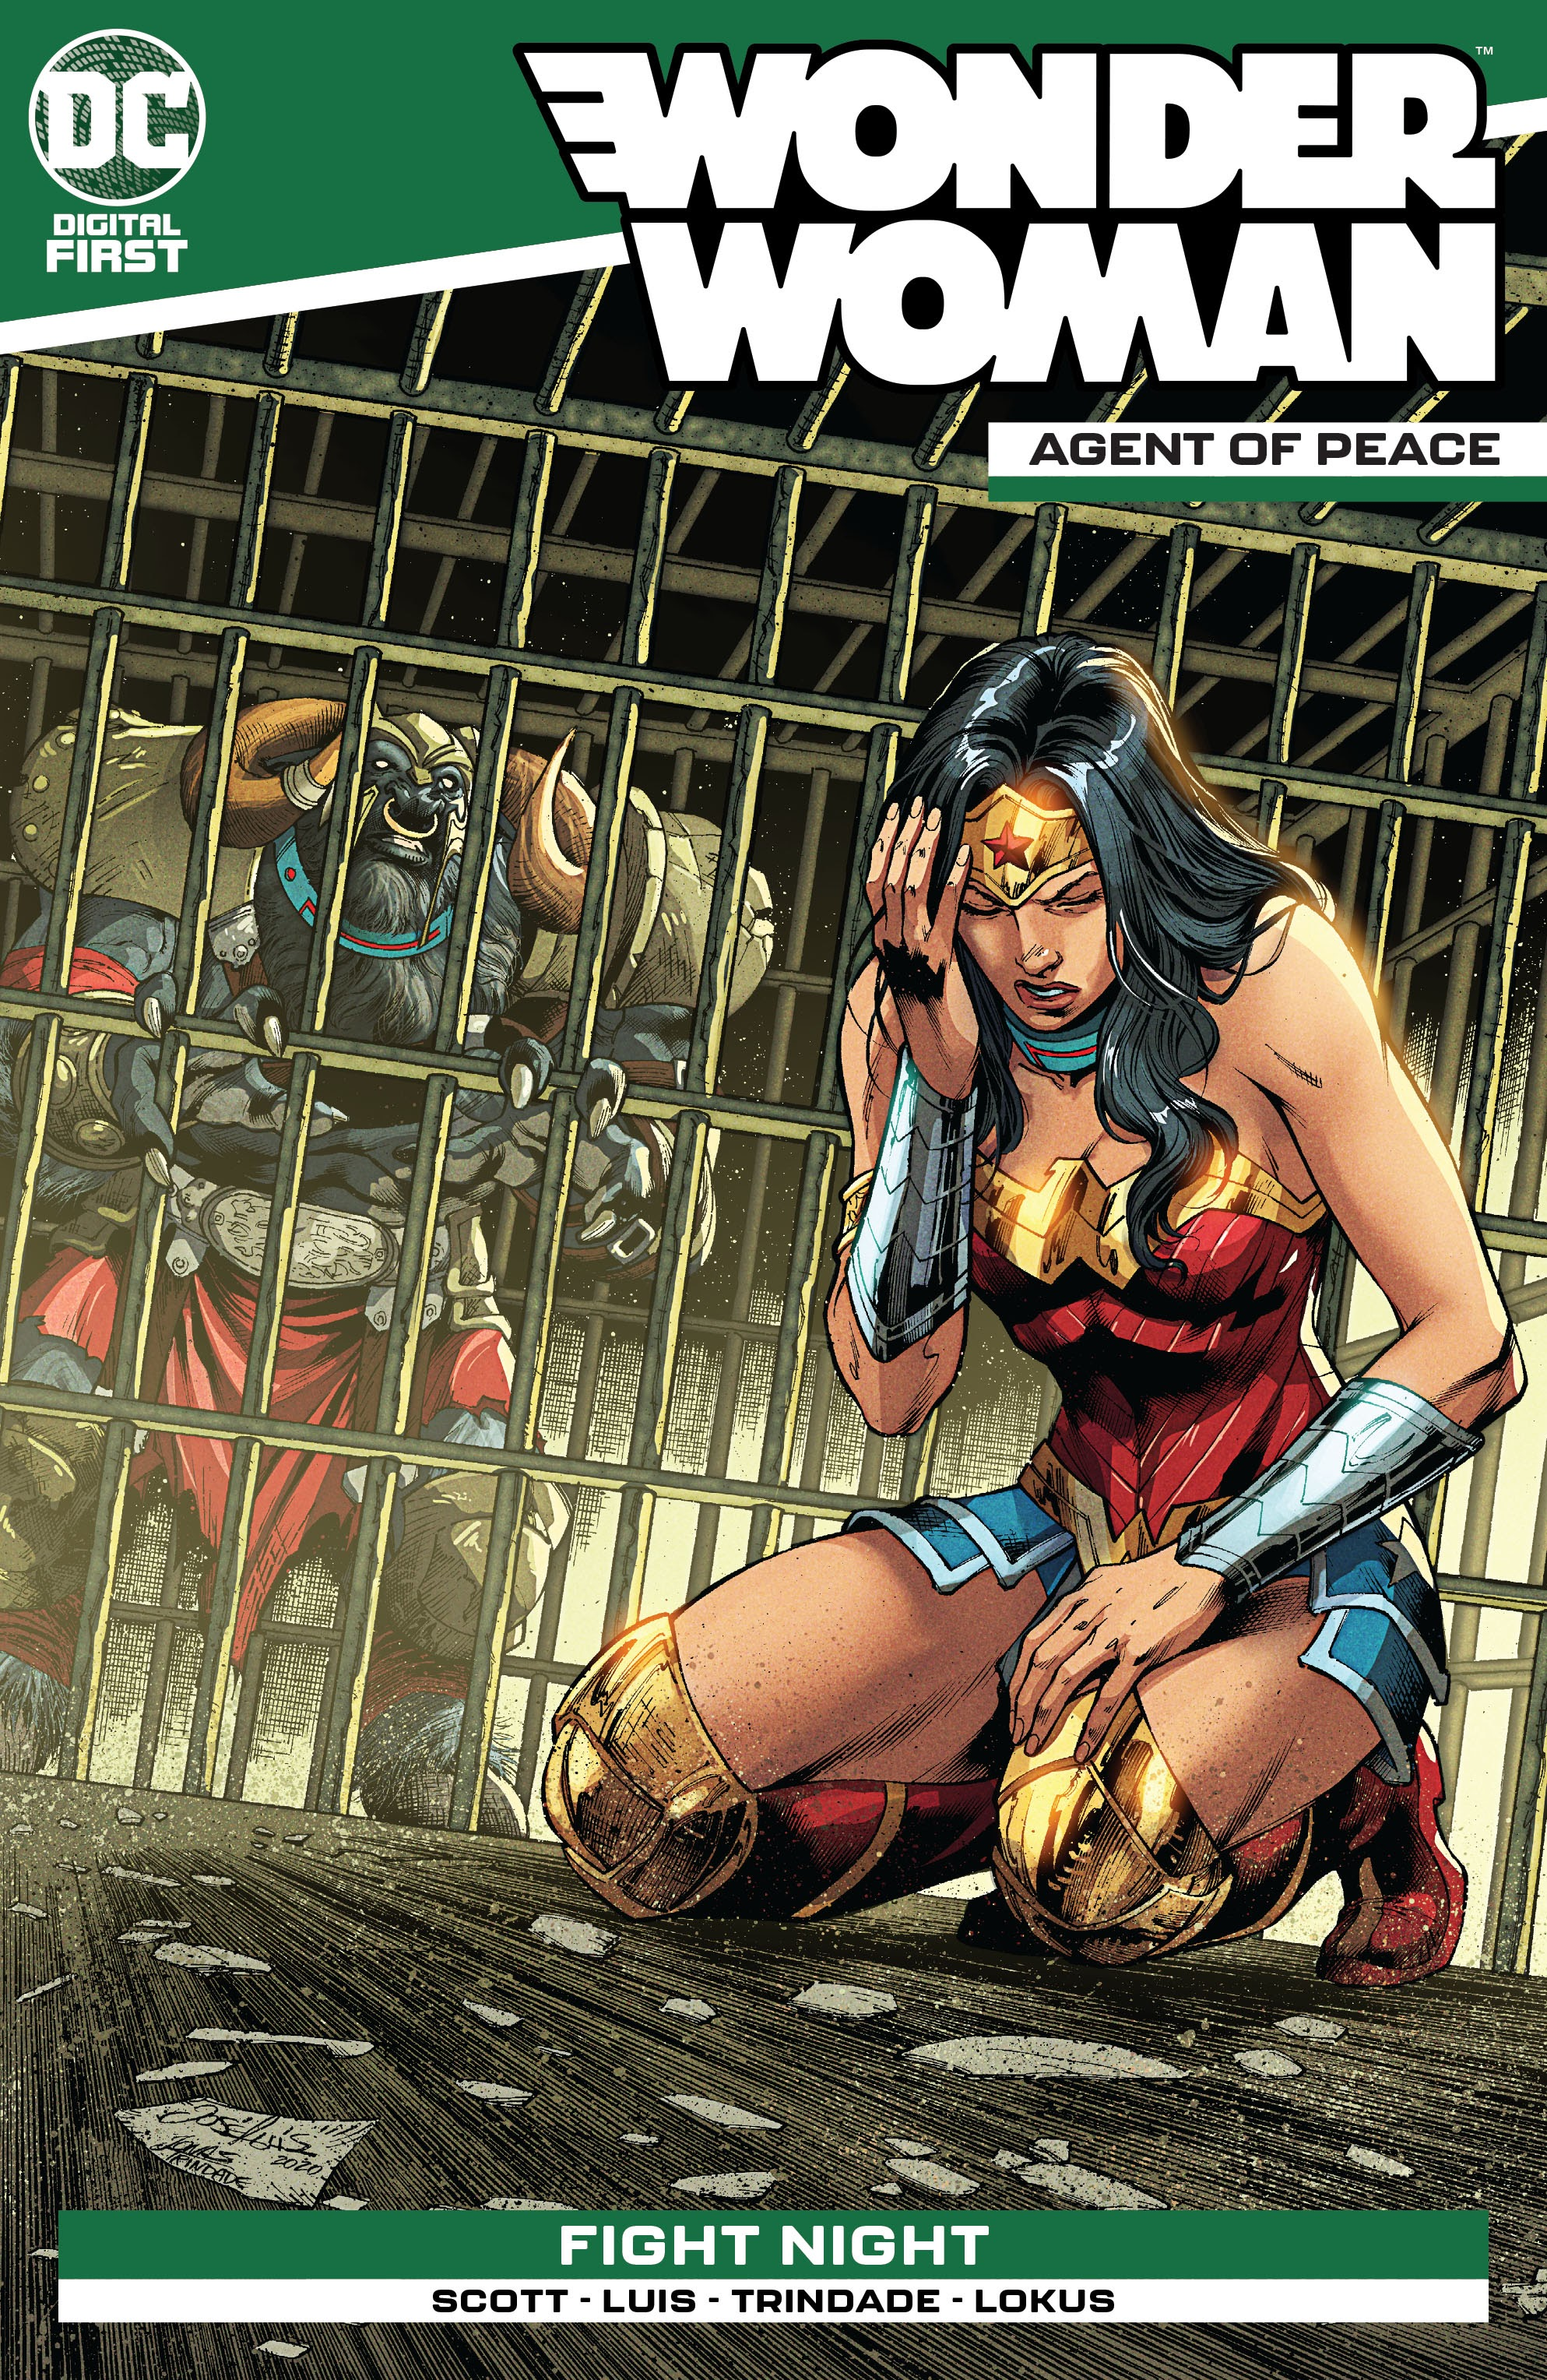 Wonder Woman: Agent of Peace Vol 1 18 (Digital)